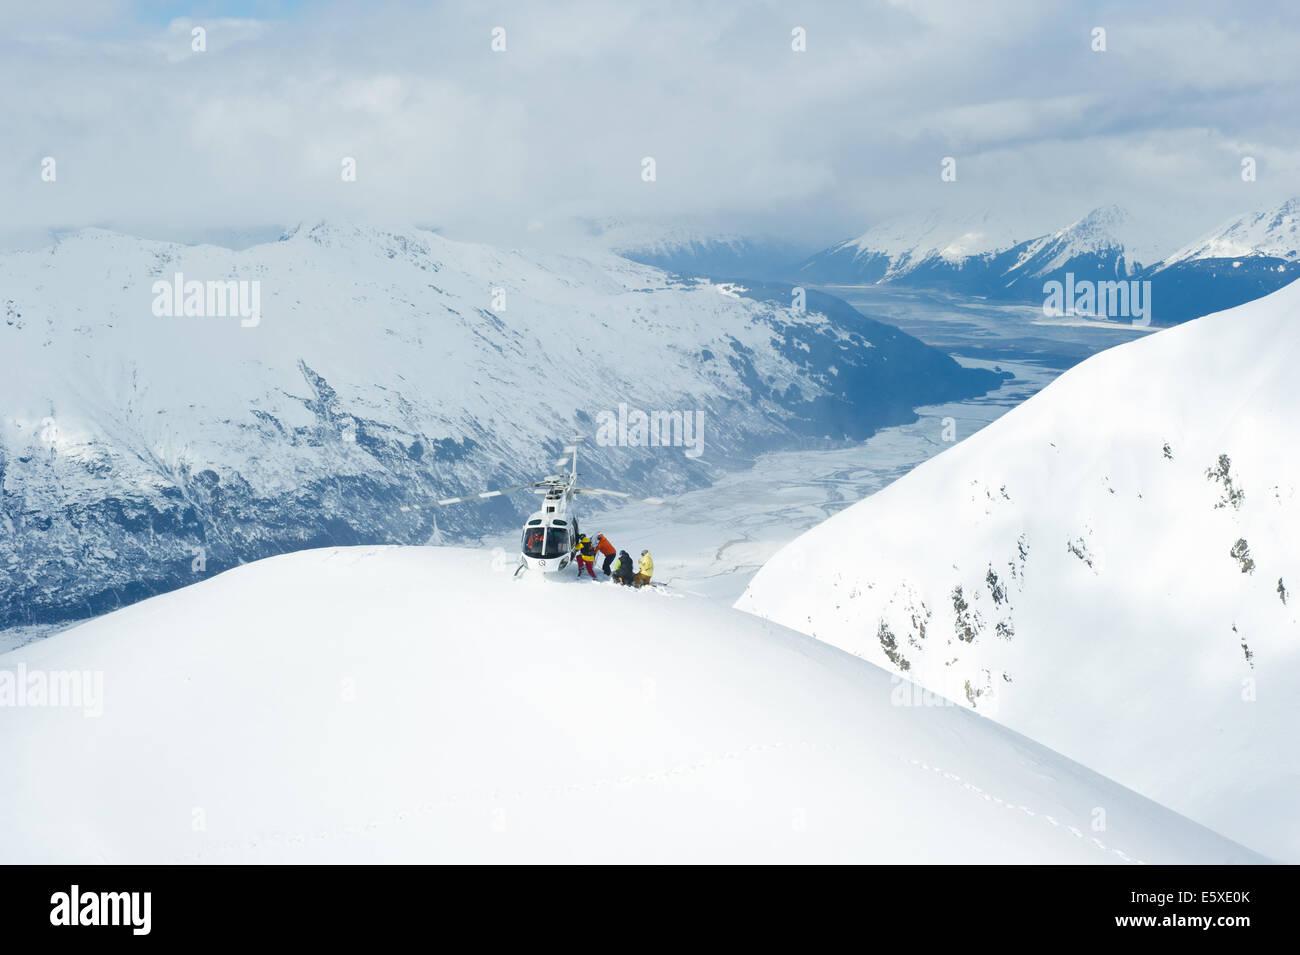 Chugach Powder Guides Go Pro Helicopter, Girdwood, Alaska. - Stock Image